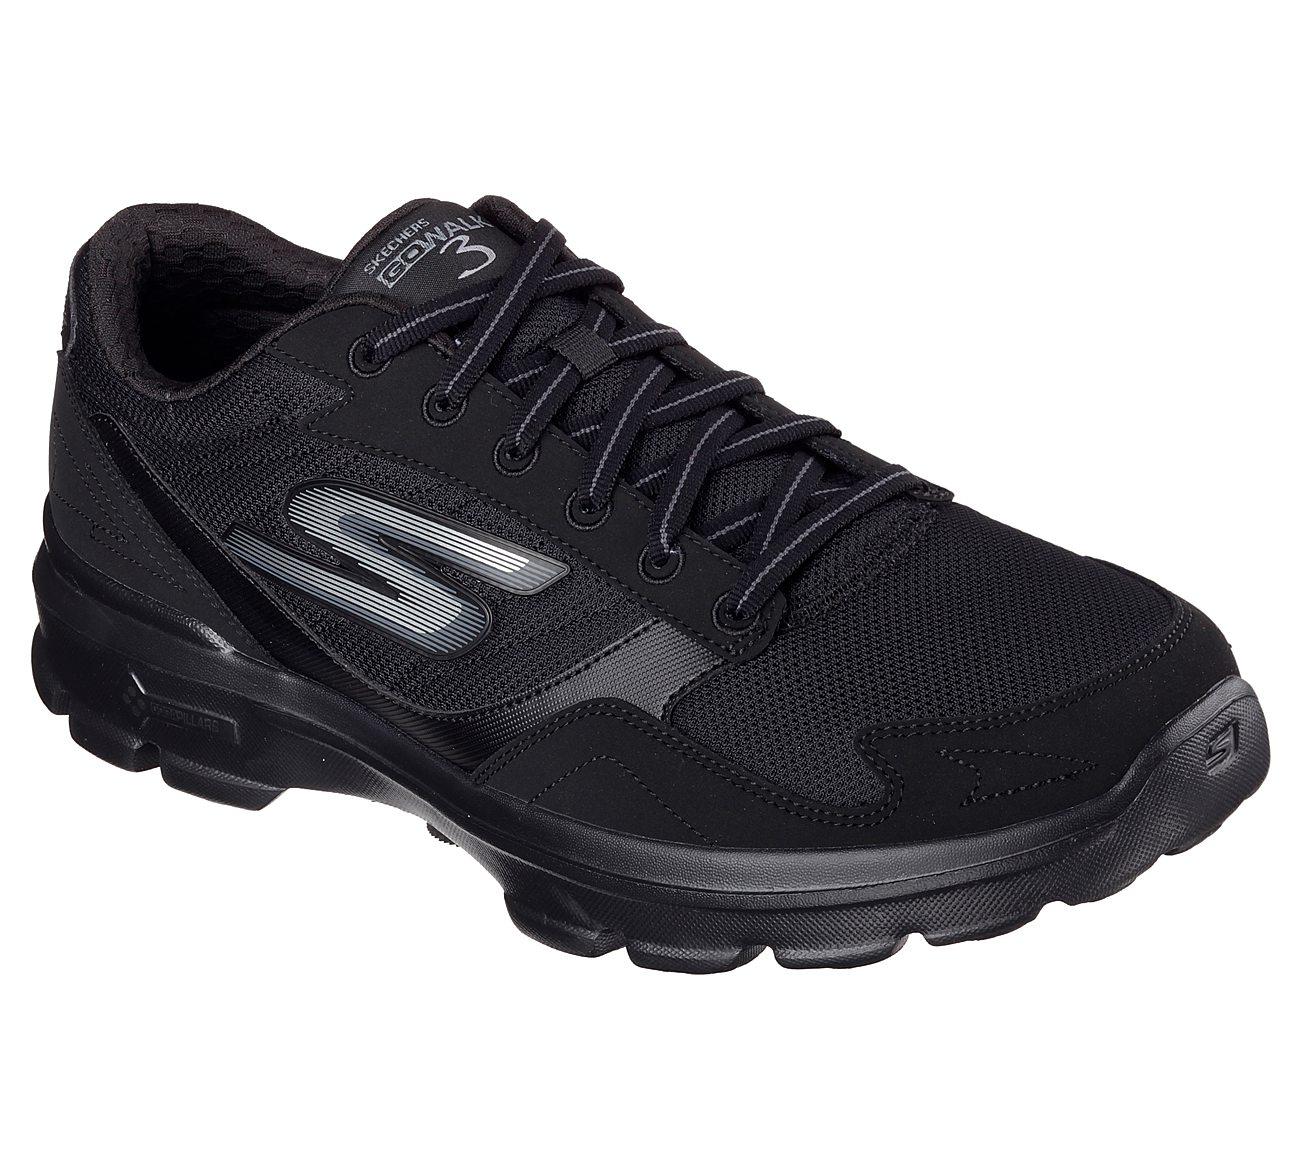 skechers go walk 3 shoes